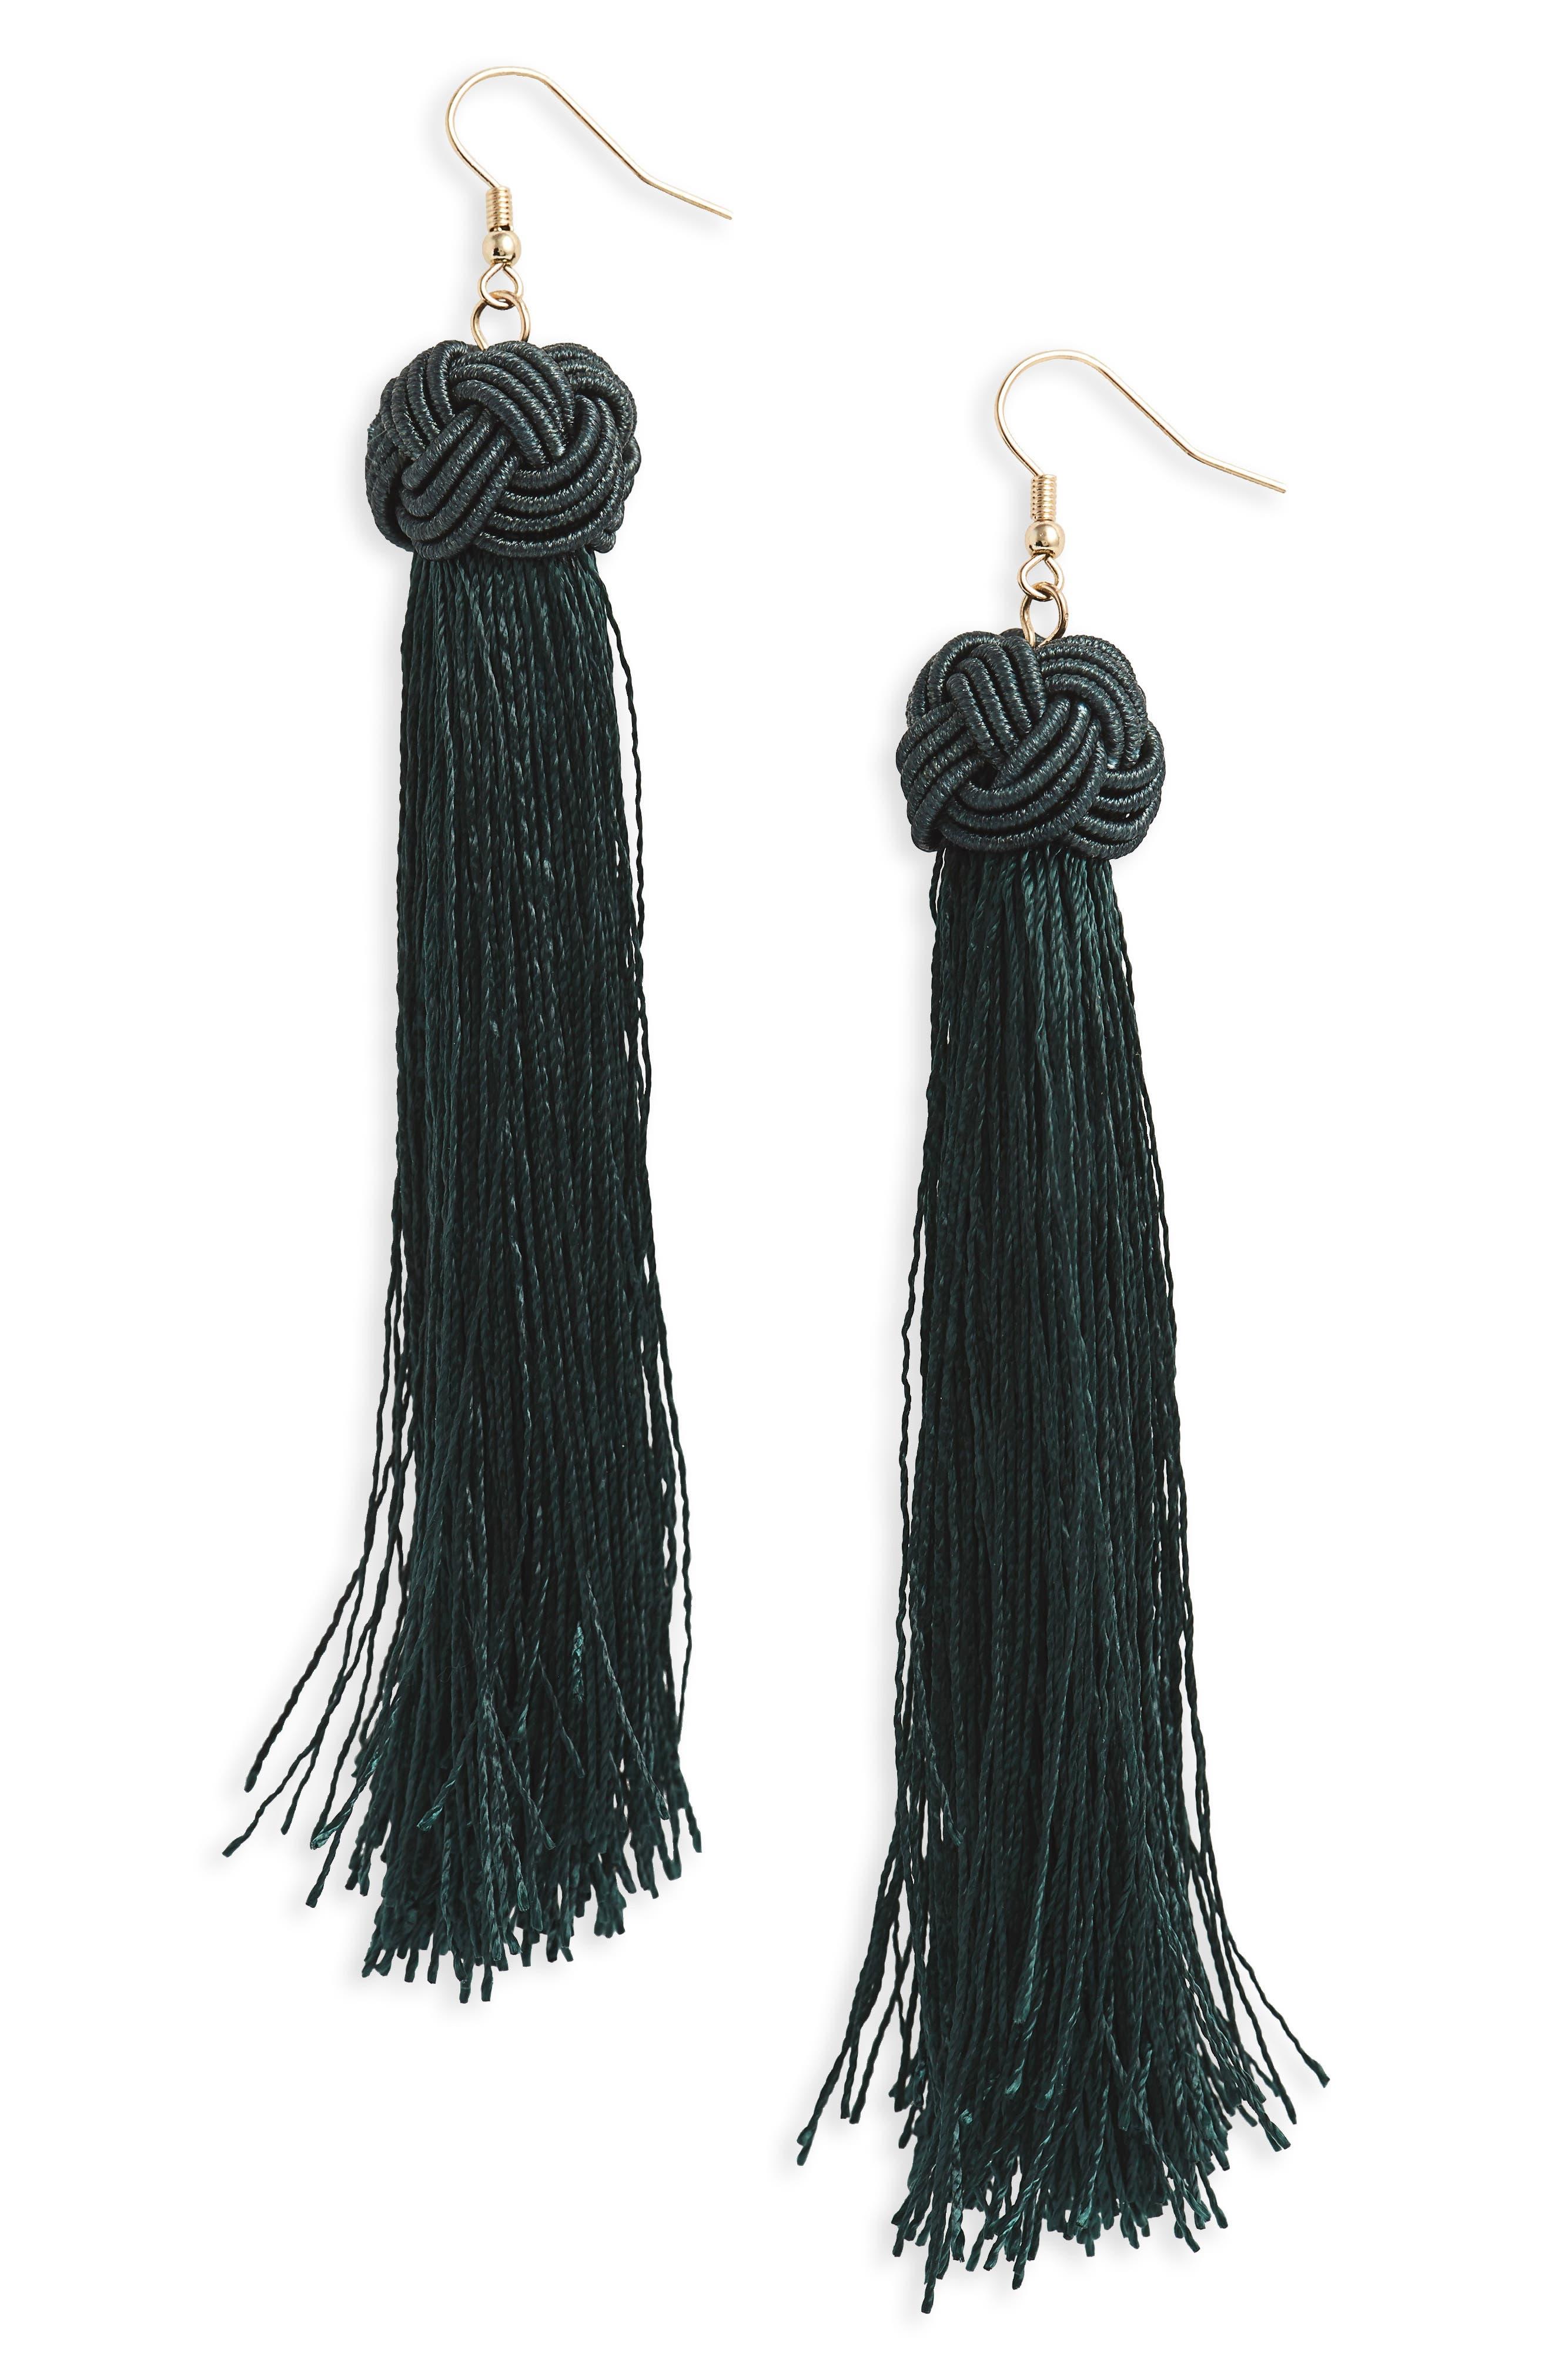 Main Image - Kitsch Tassel Earrings